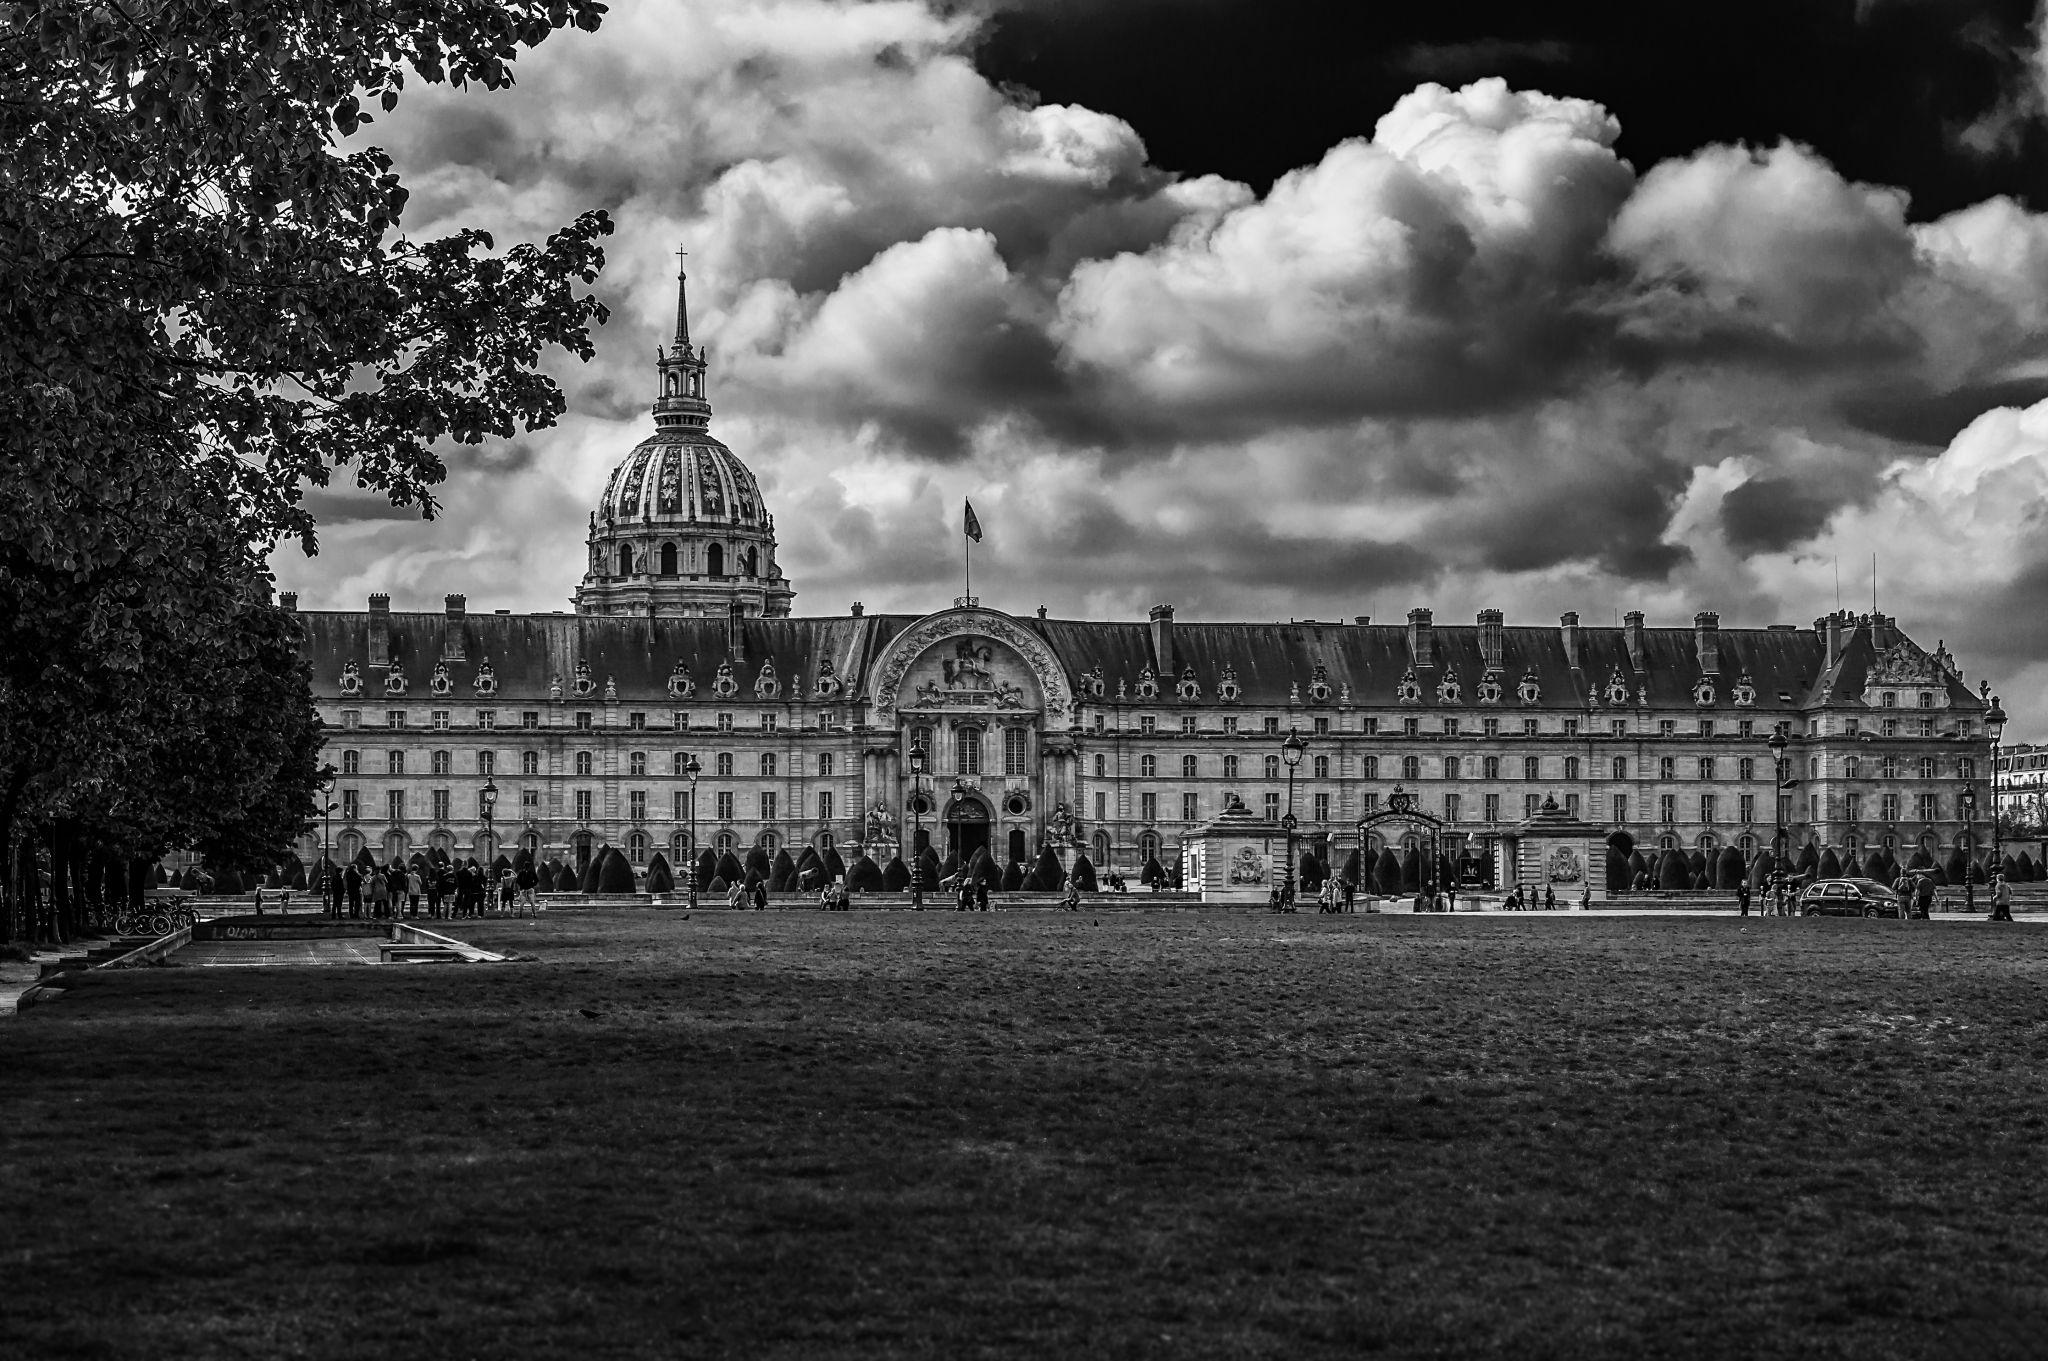 Les Invalides, France